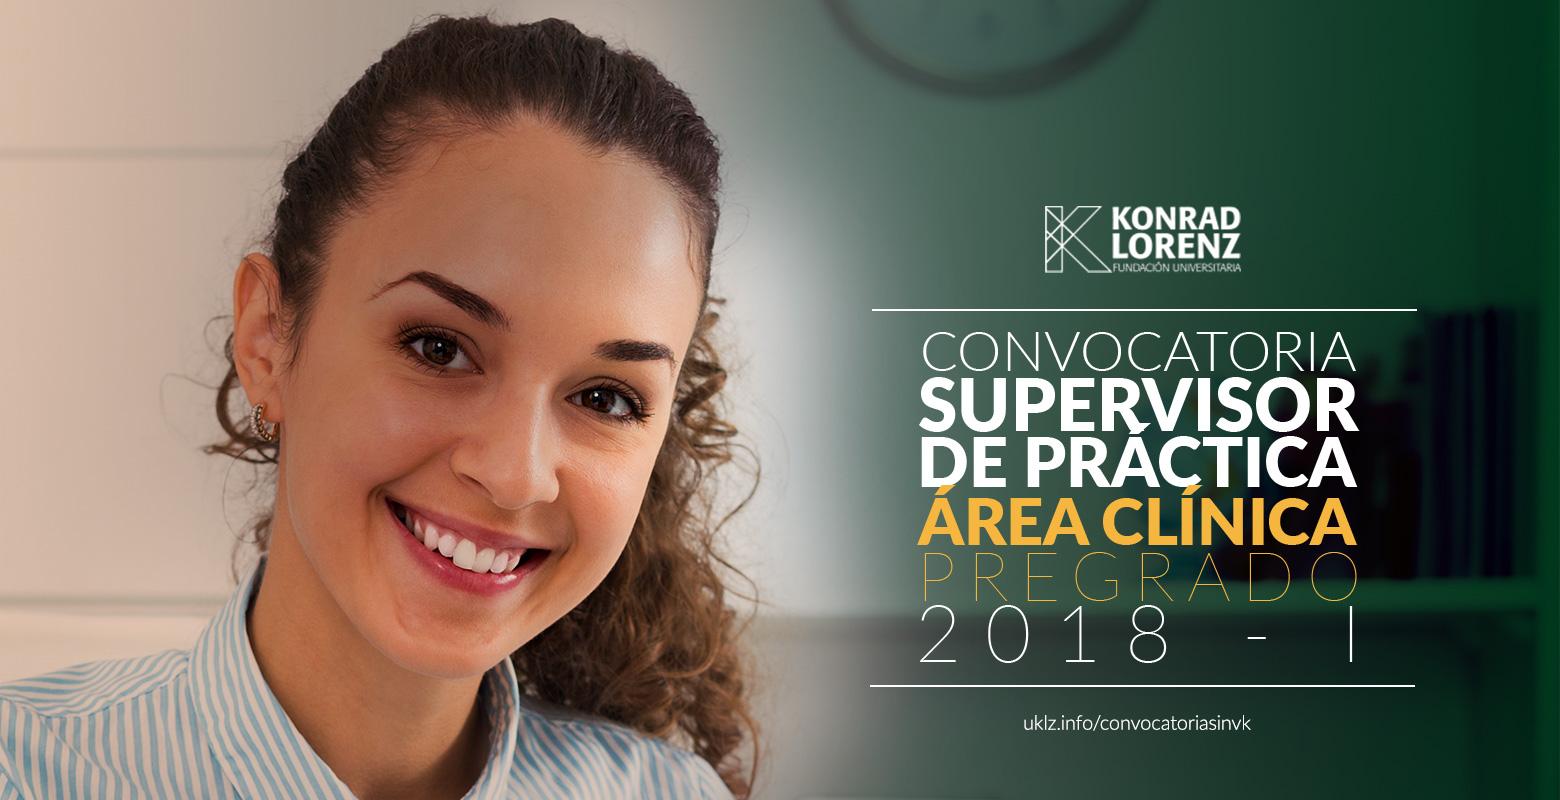 Convocatoria para vincular Supervisores de Práctica Clínica